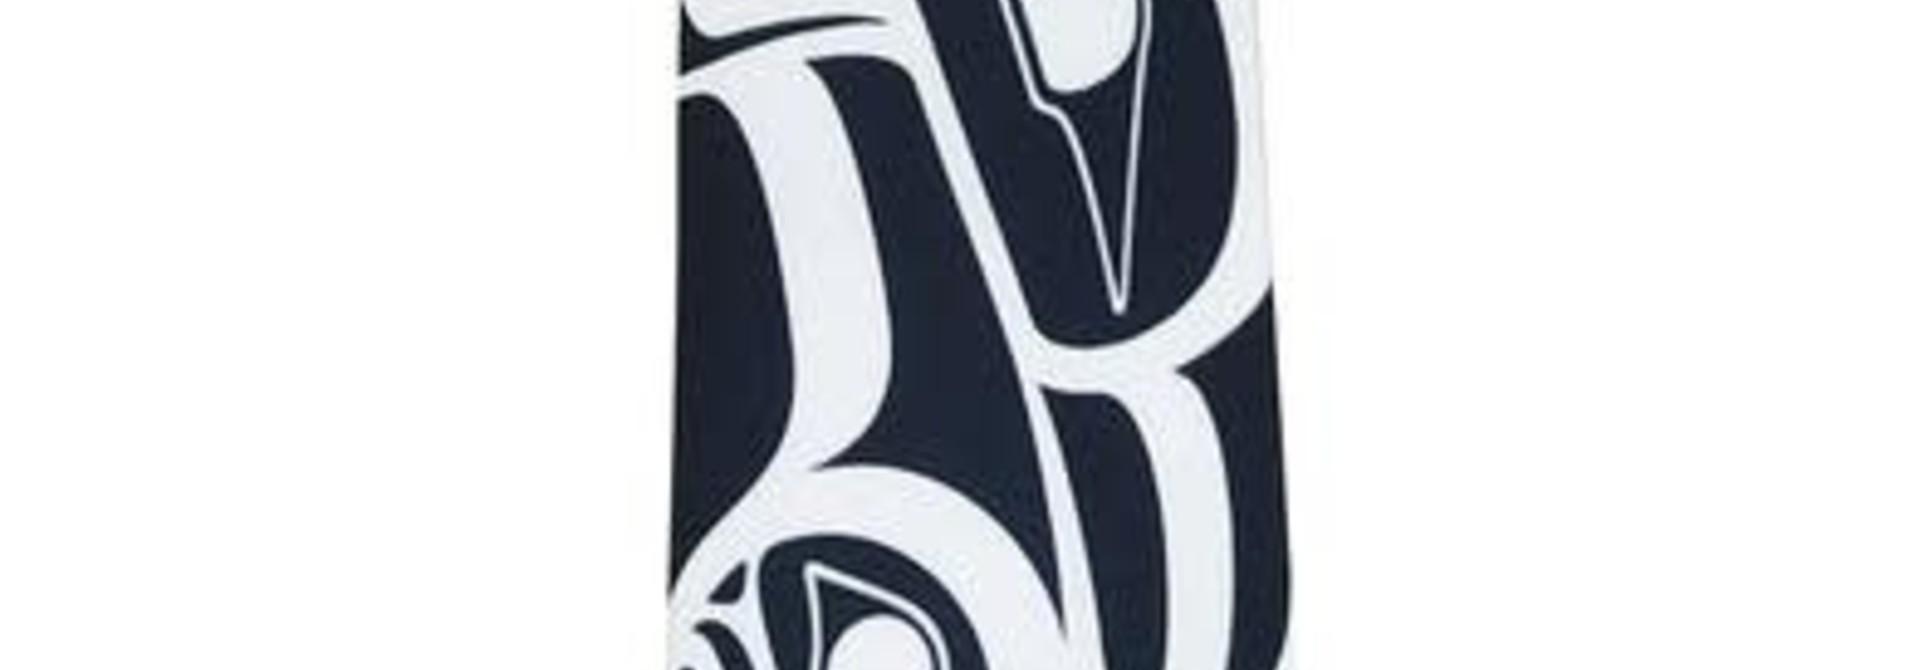 Raven Silk Tie-Roy Henry Vickers